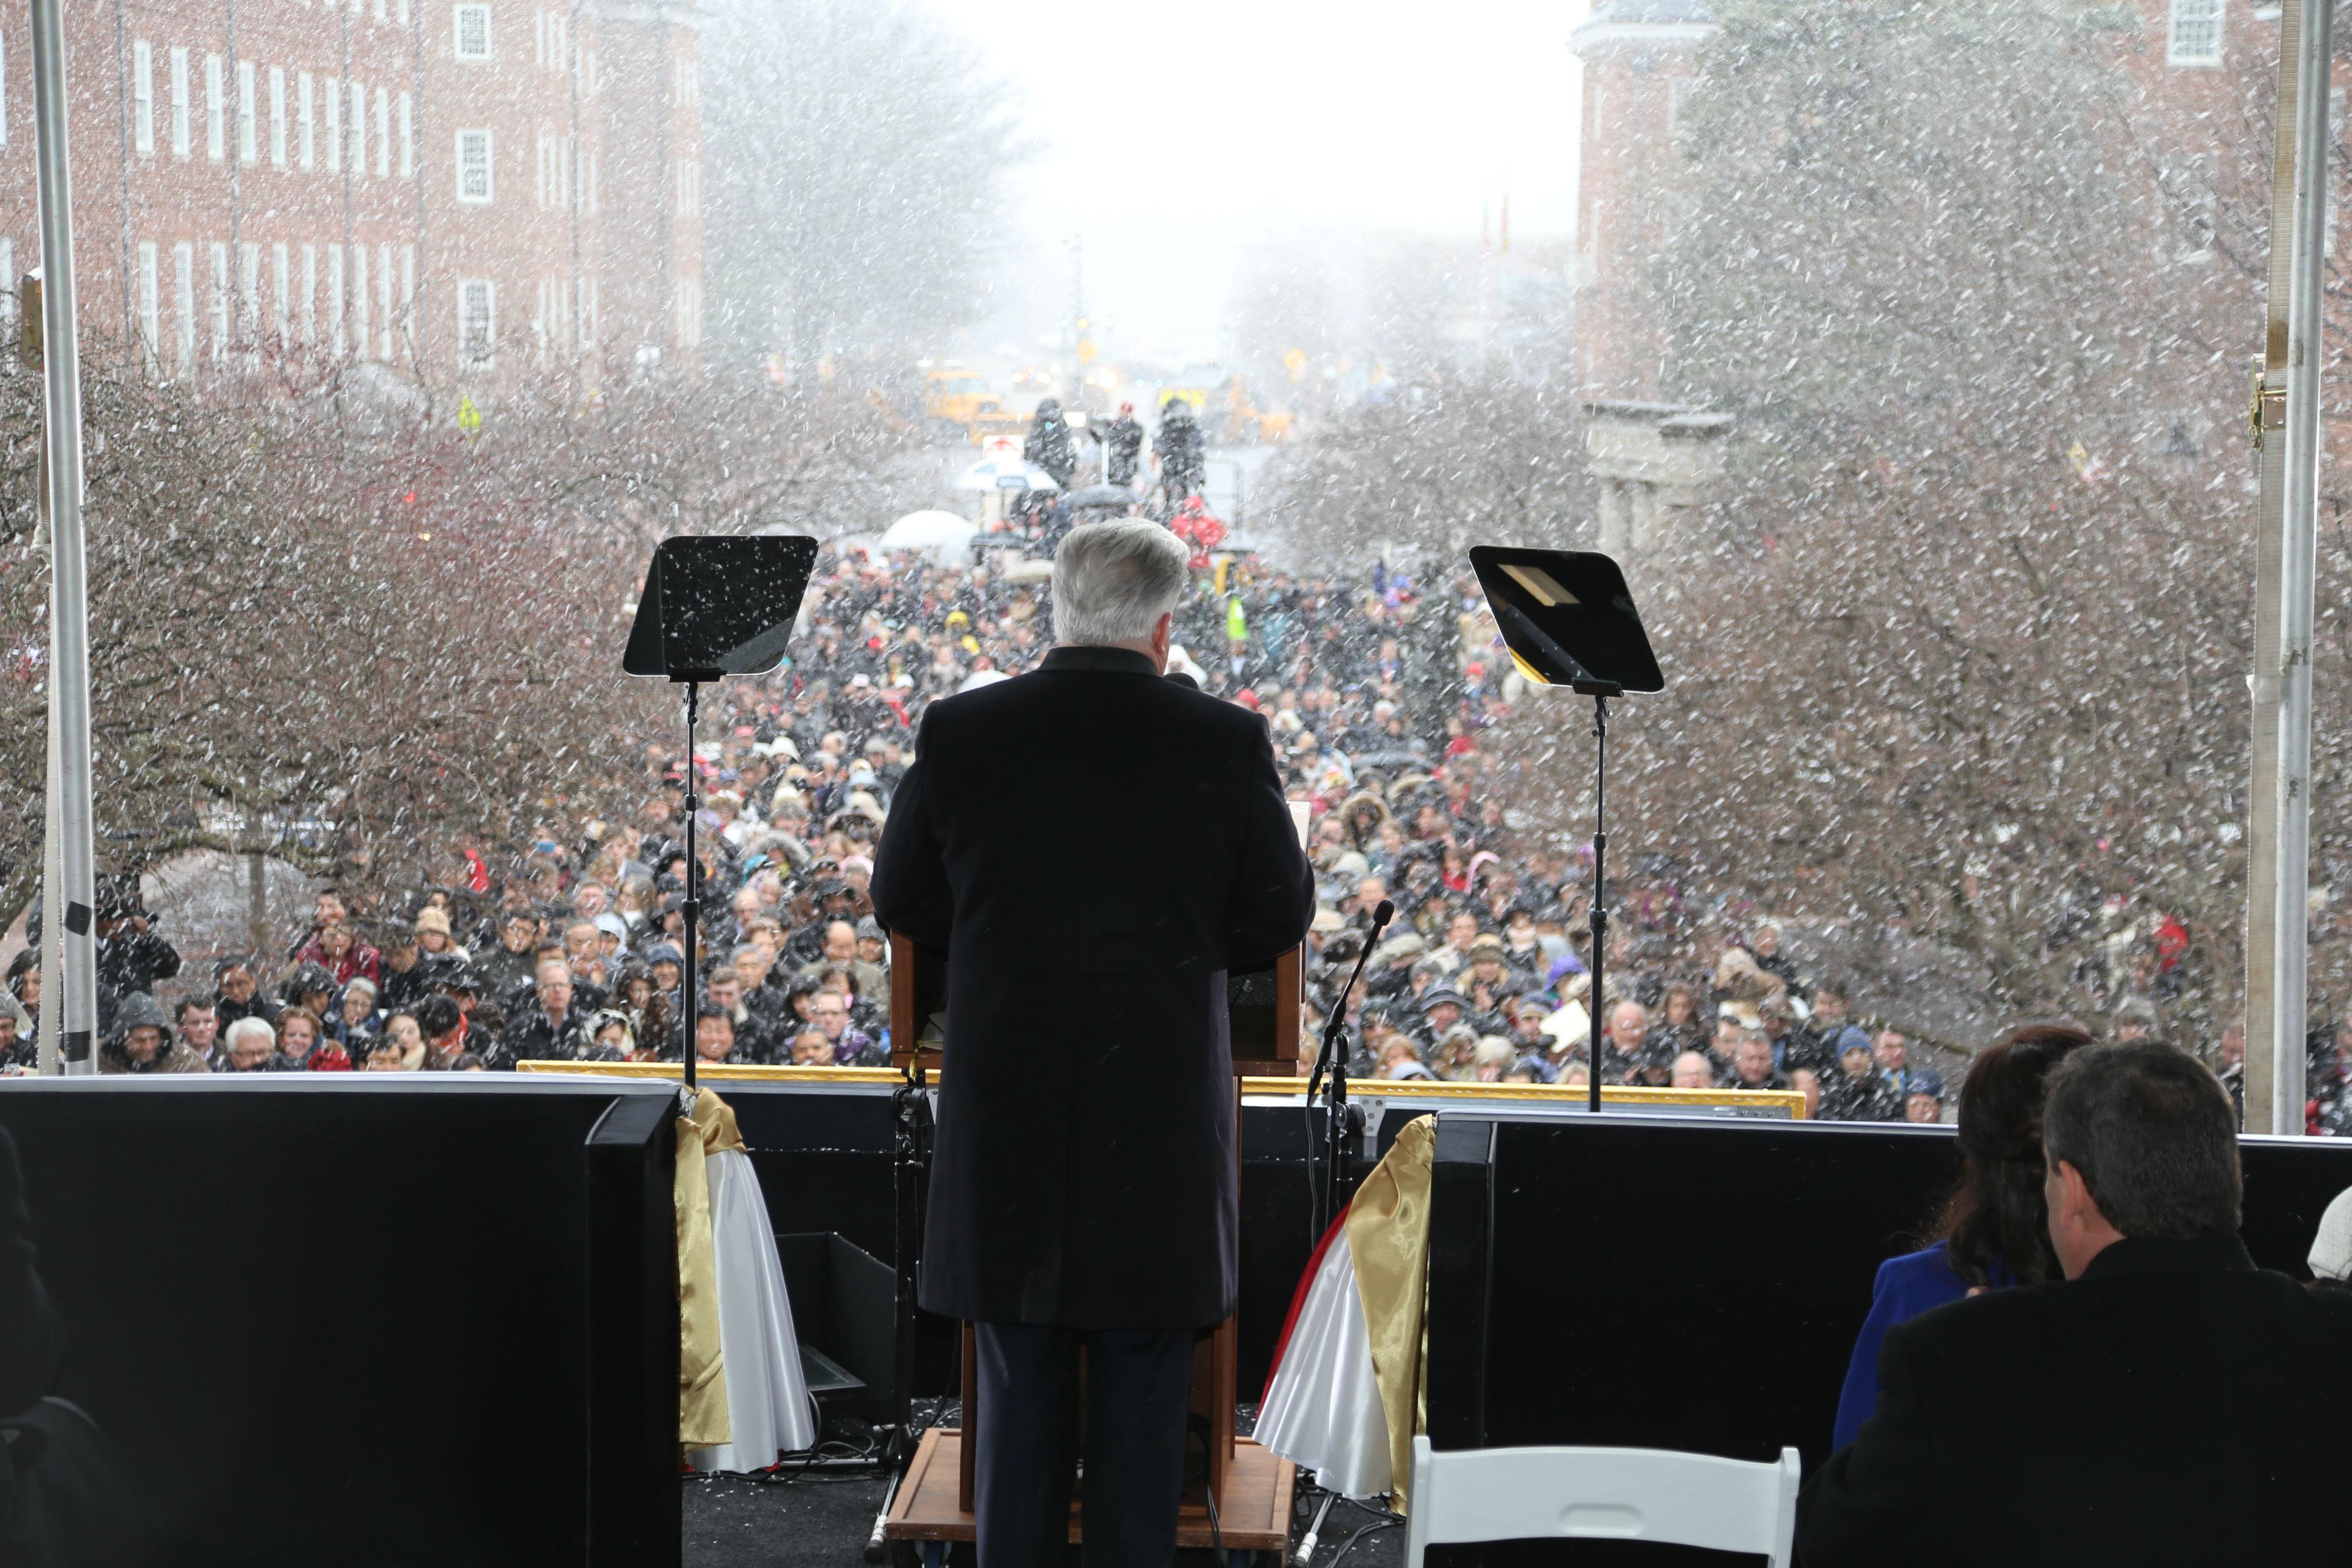 Hogan pledges 'new spirit of bipartisan cooperation'